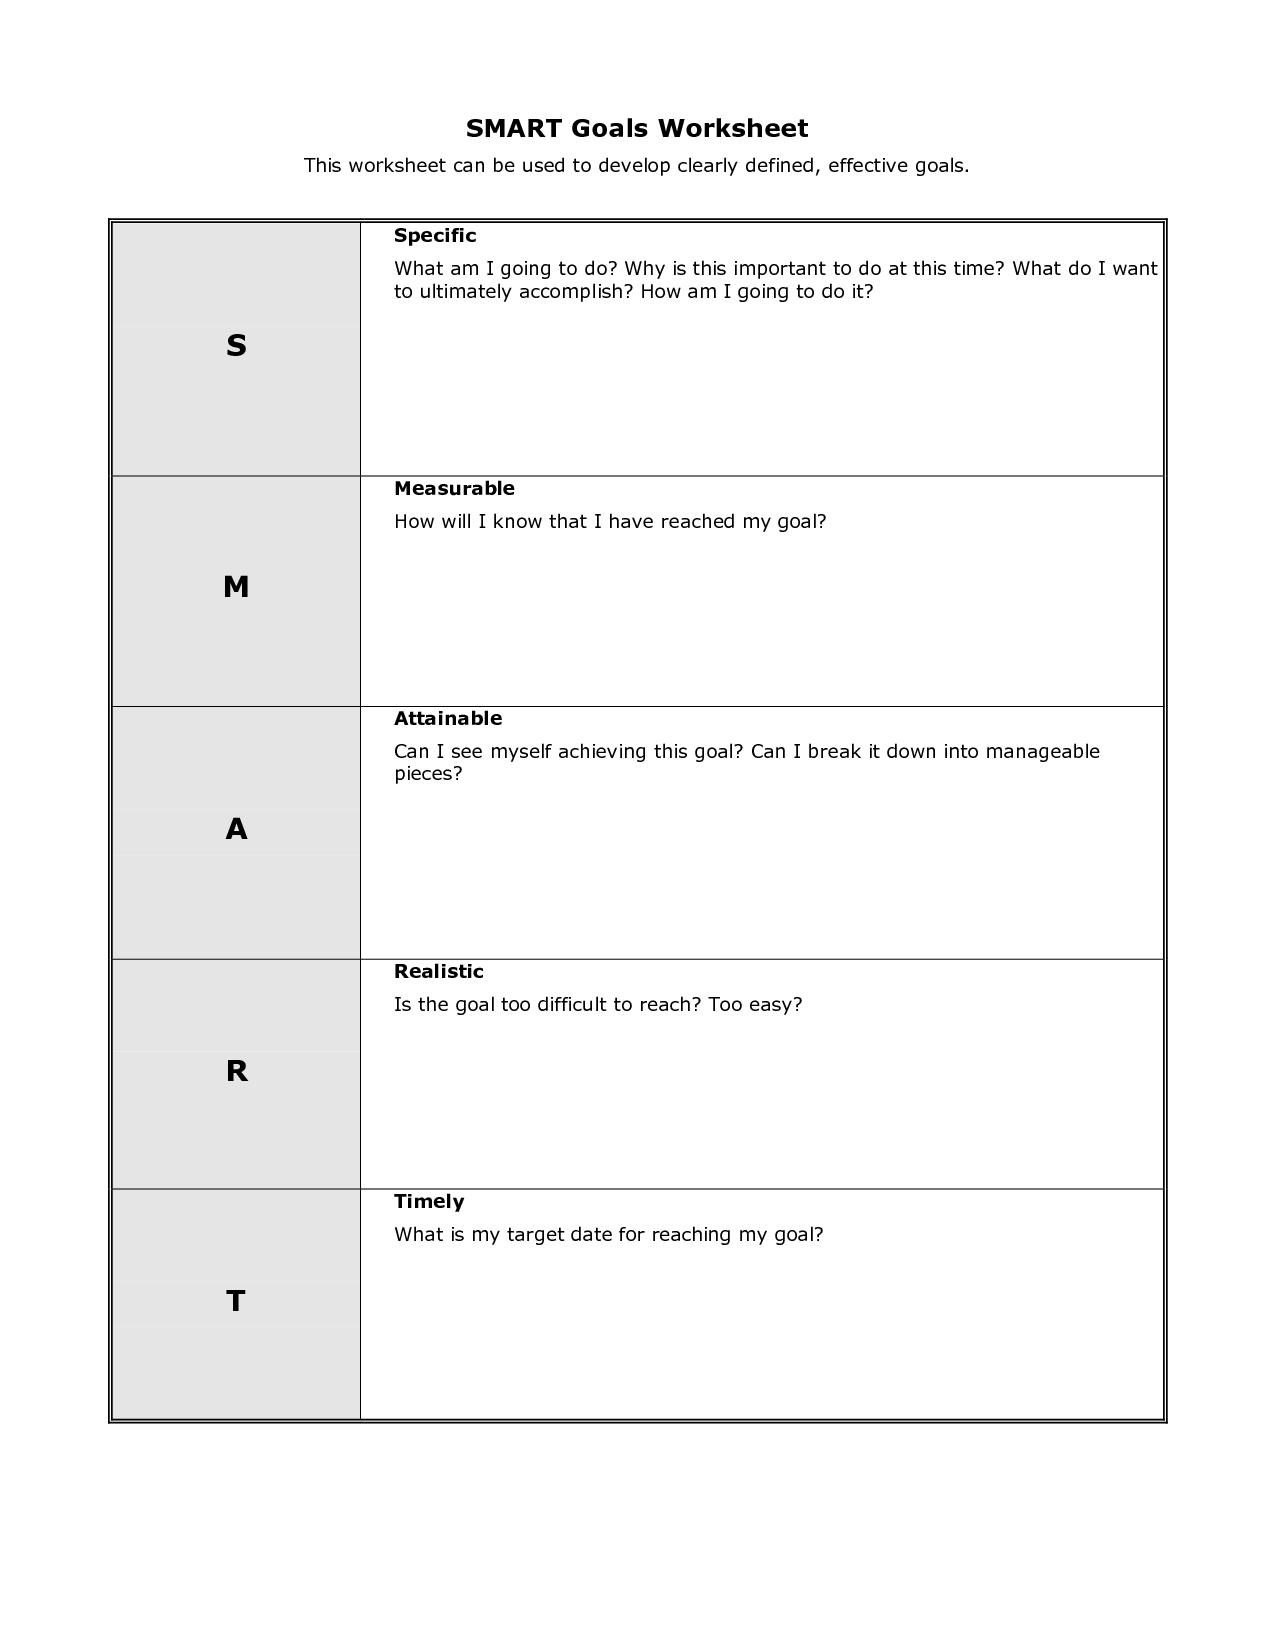 Personal Smart Goal Worksheet Template